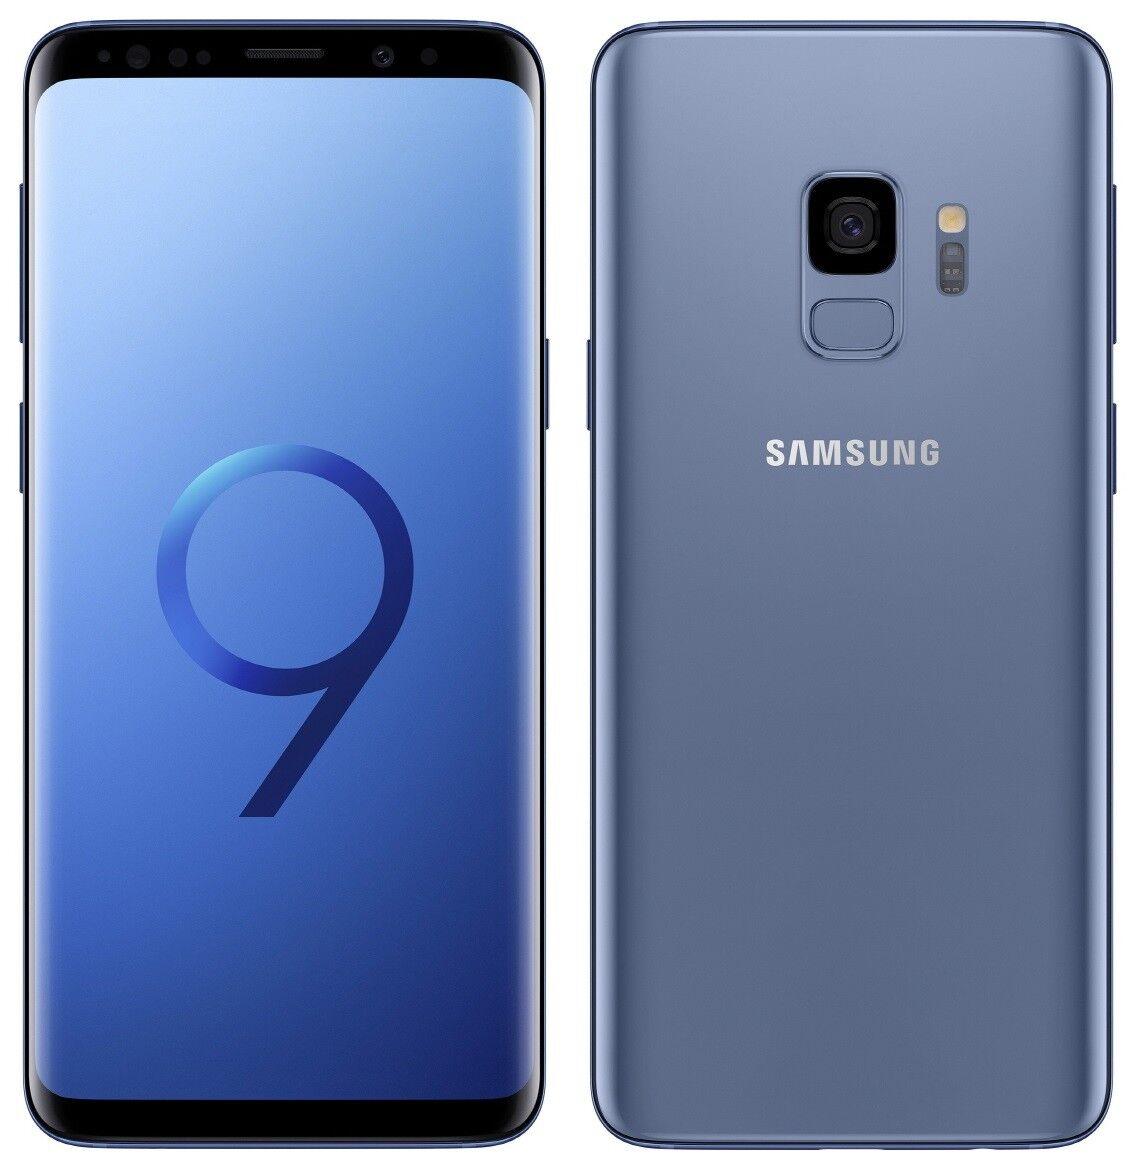 Samsung Galaxy S9 SM-G960F/DS Dual Sim (FACTORY UNLOCKED) 5.8